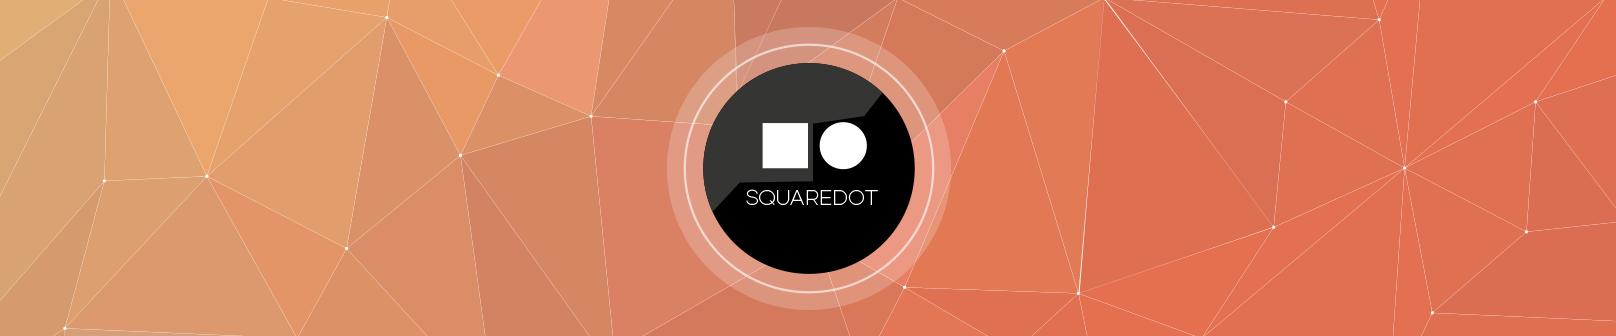 Squaredot Content Marketing and SEO